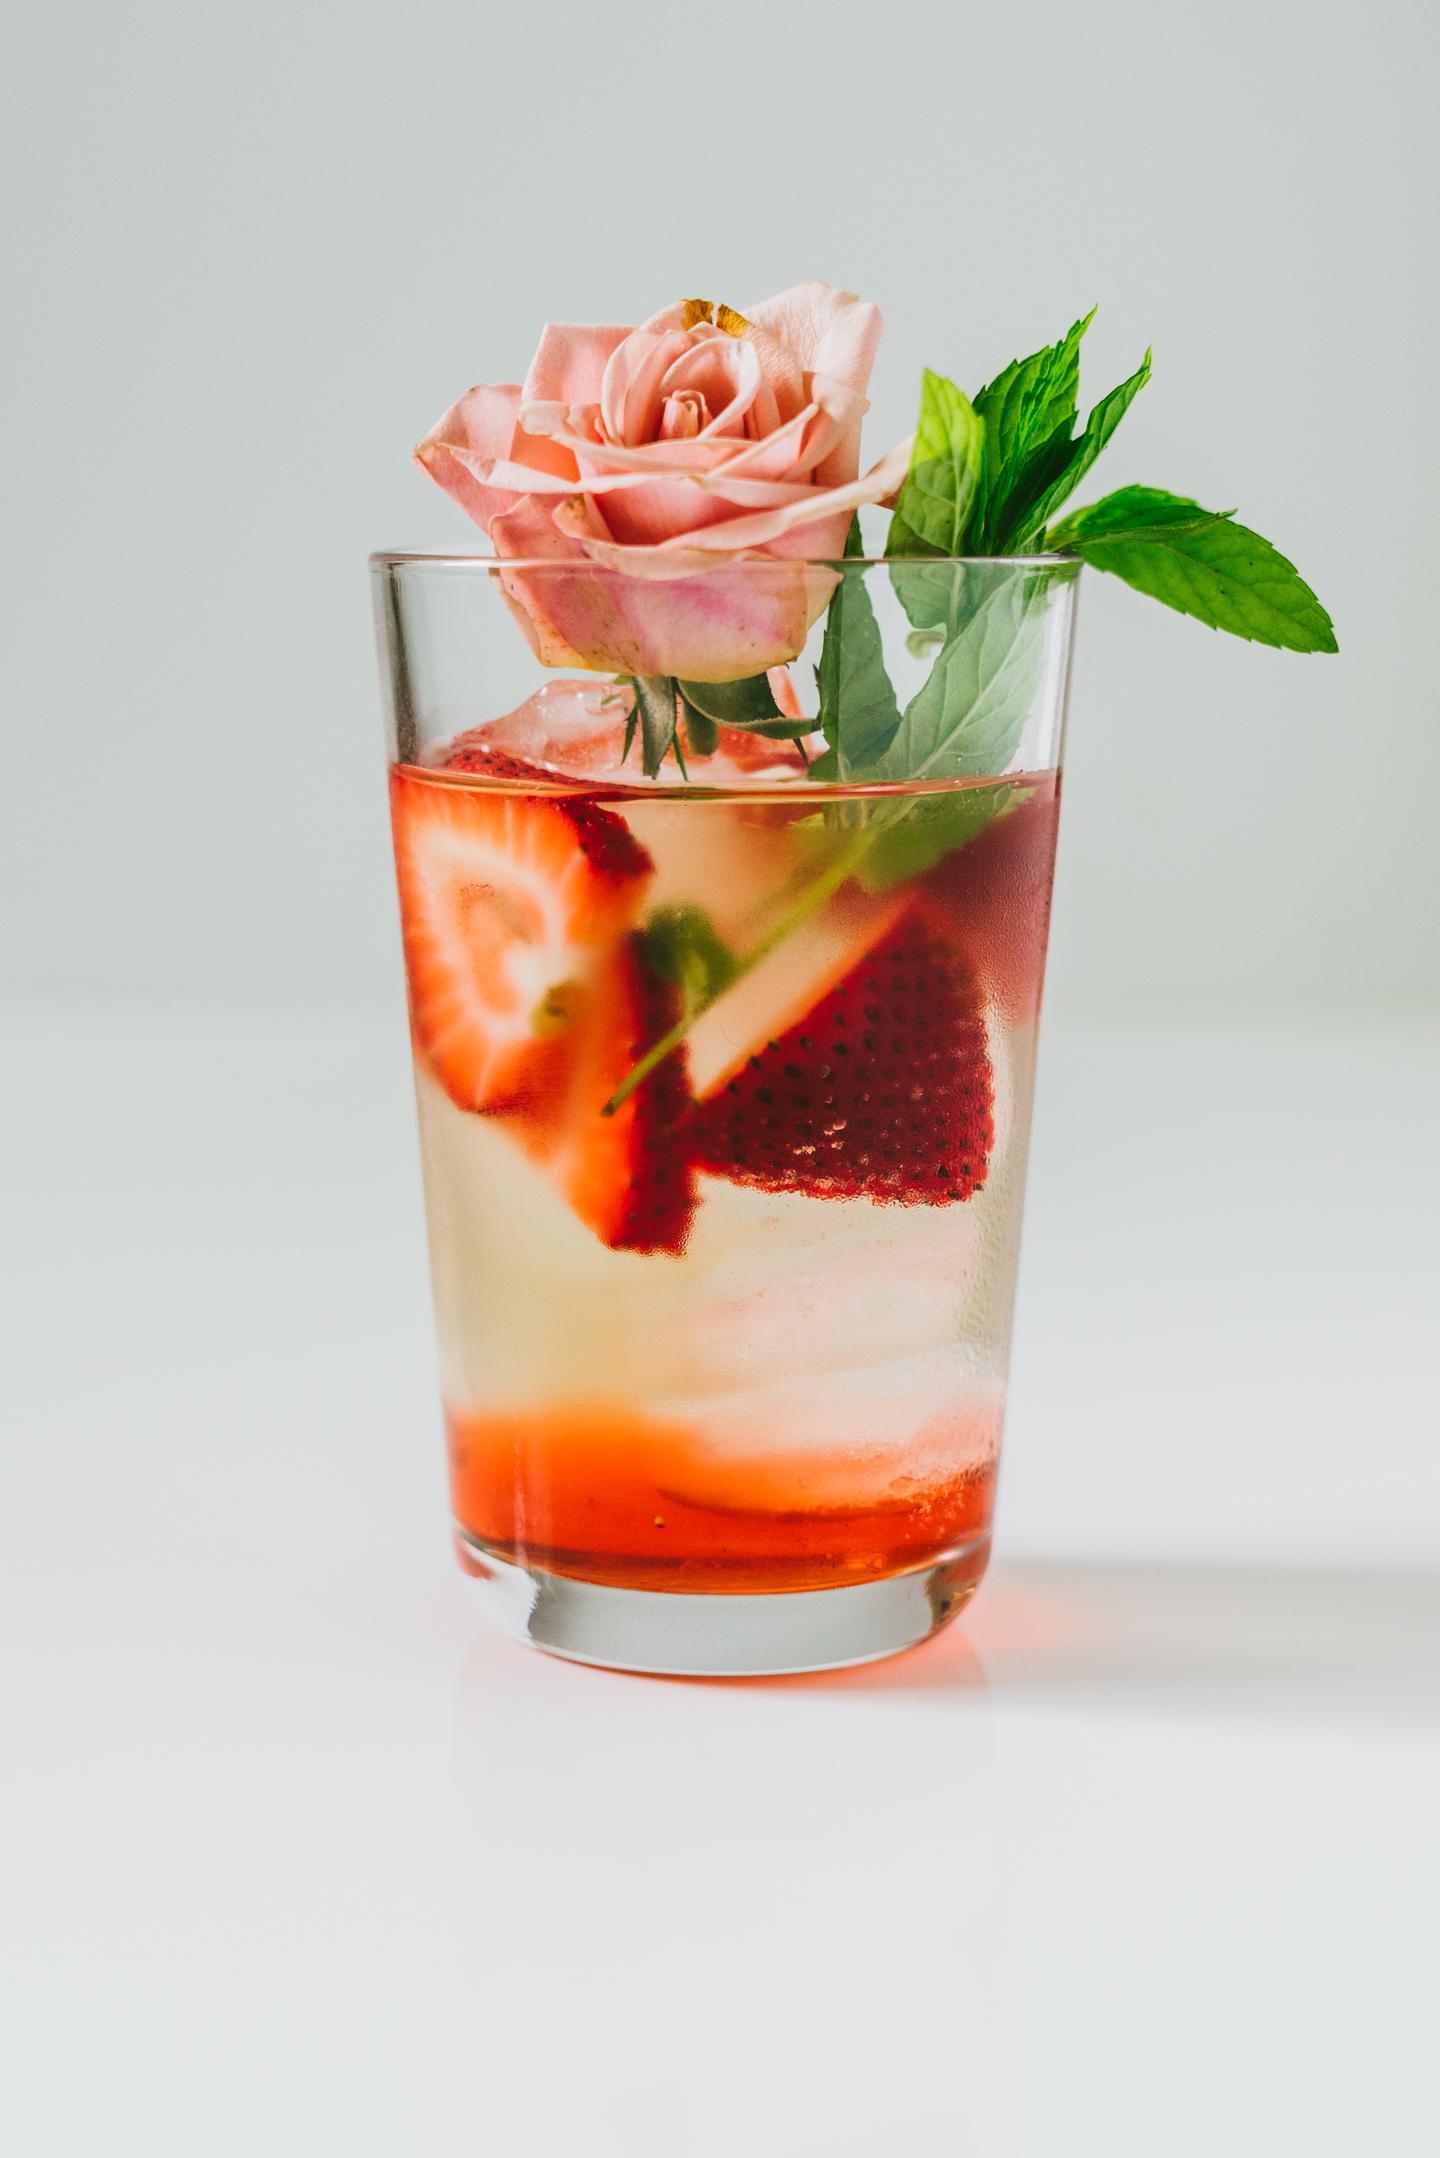 strawberry rose iced tea